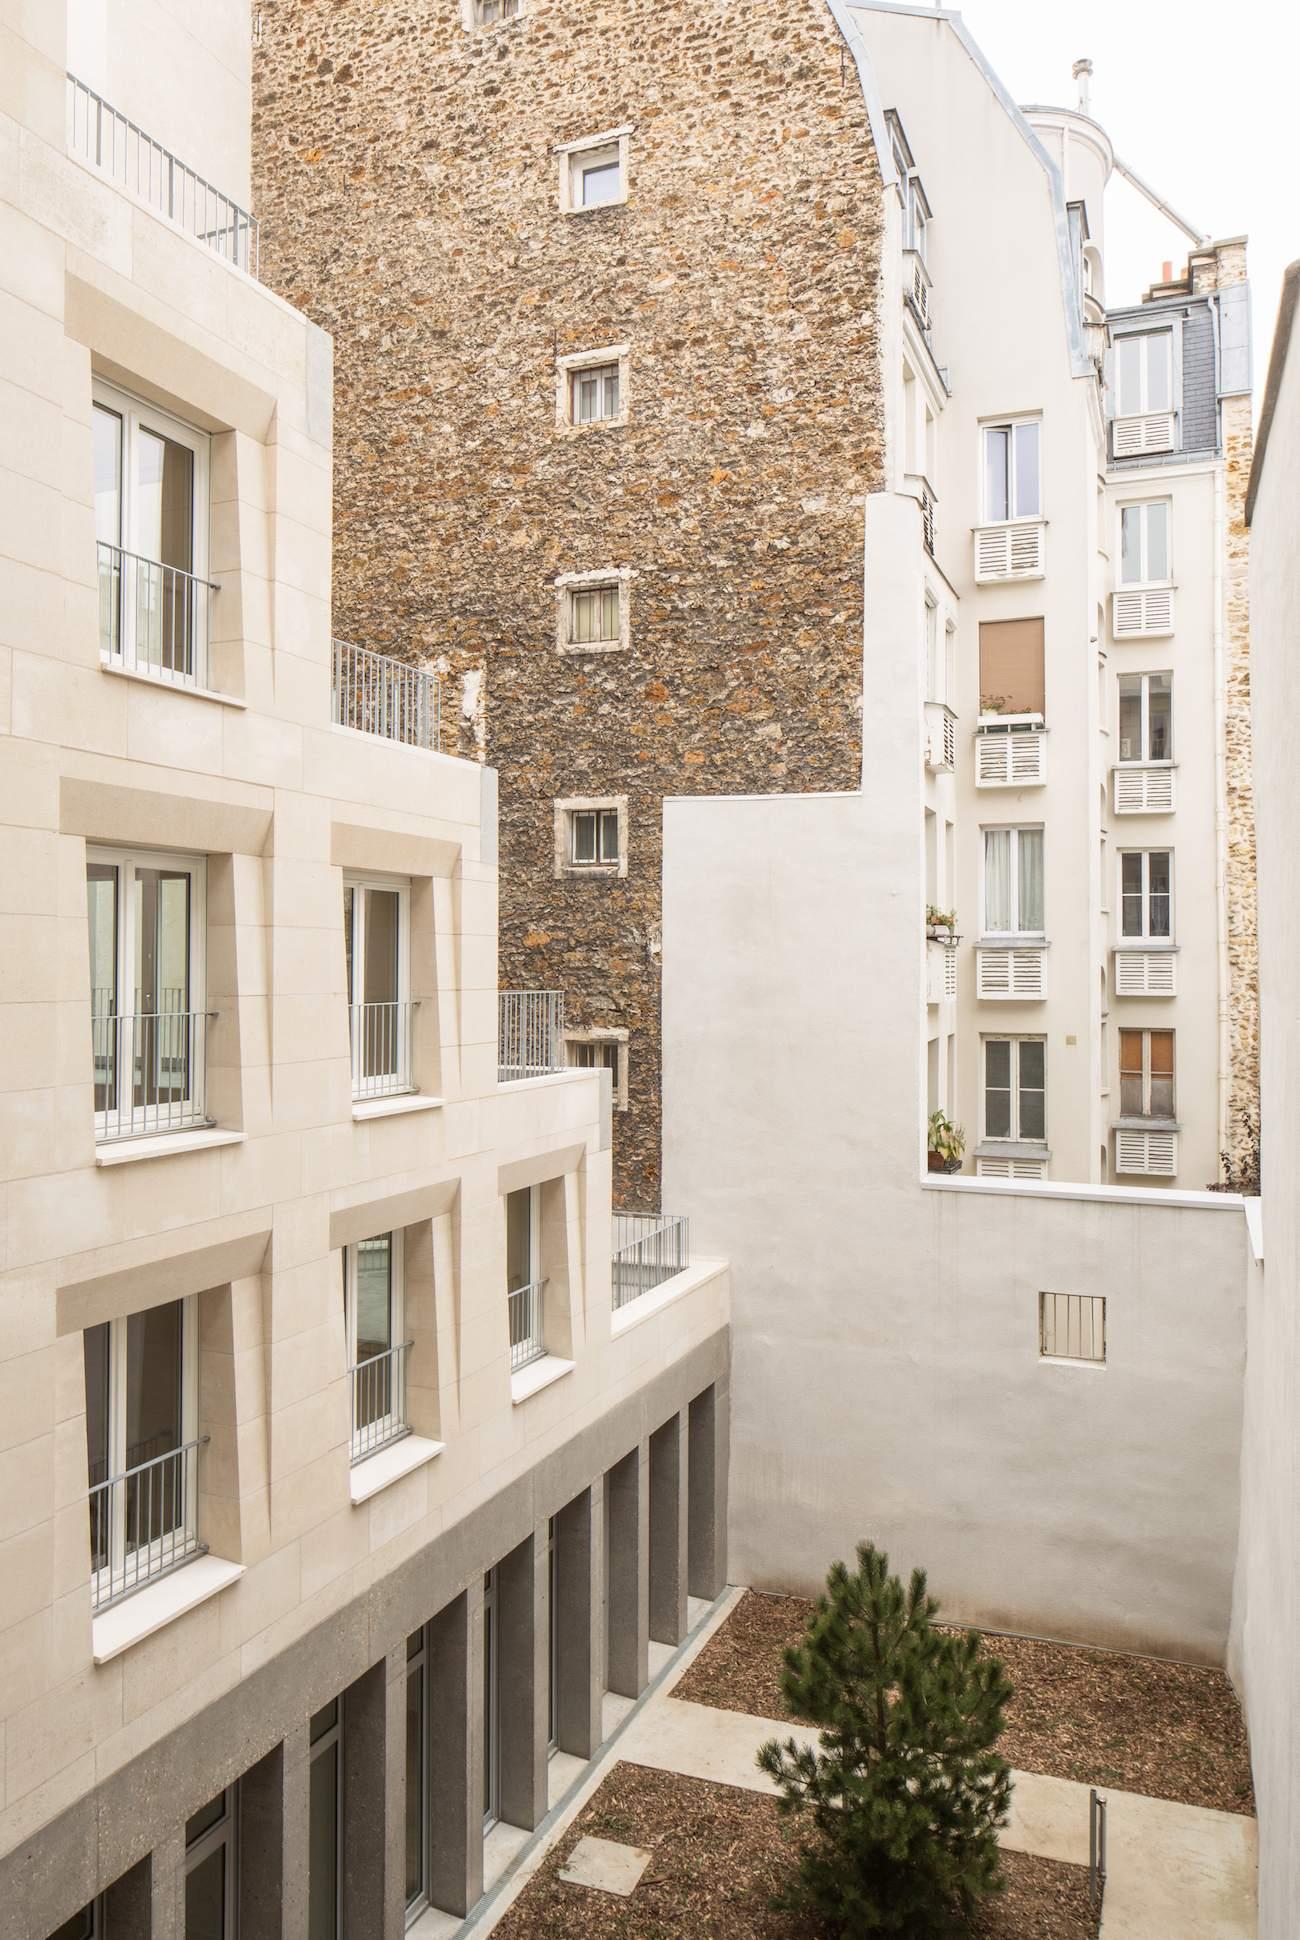 Barrault & Pressacco livrent des logements en pierre massive: innovation vernaculaire?